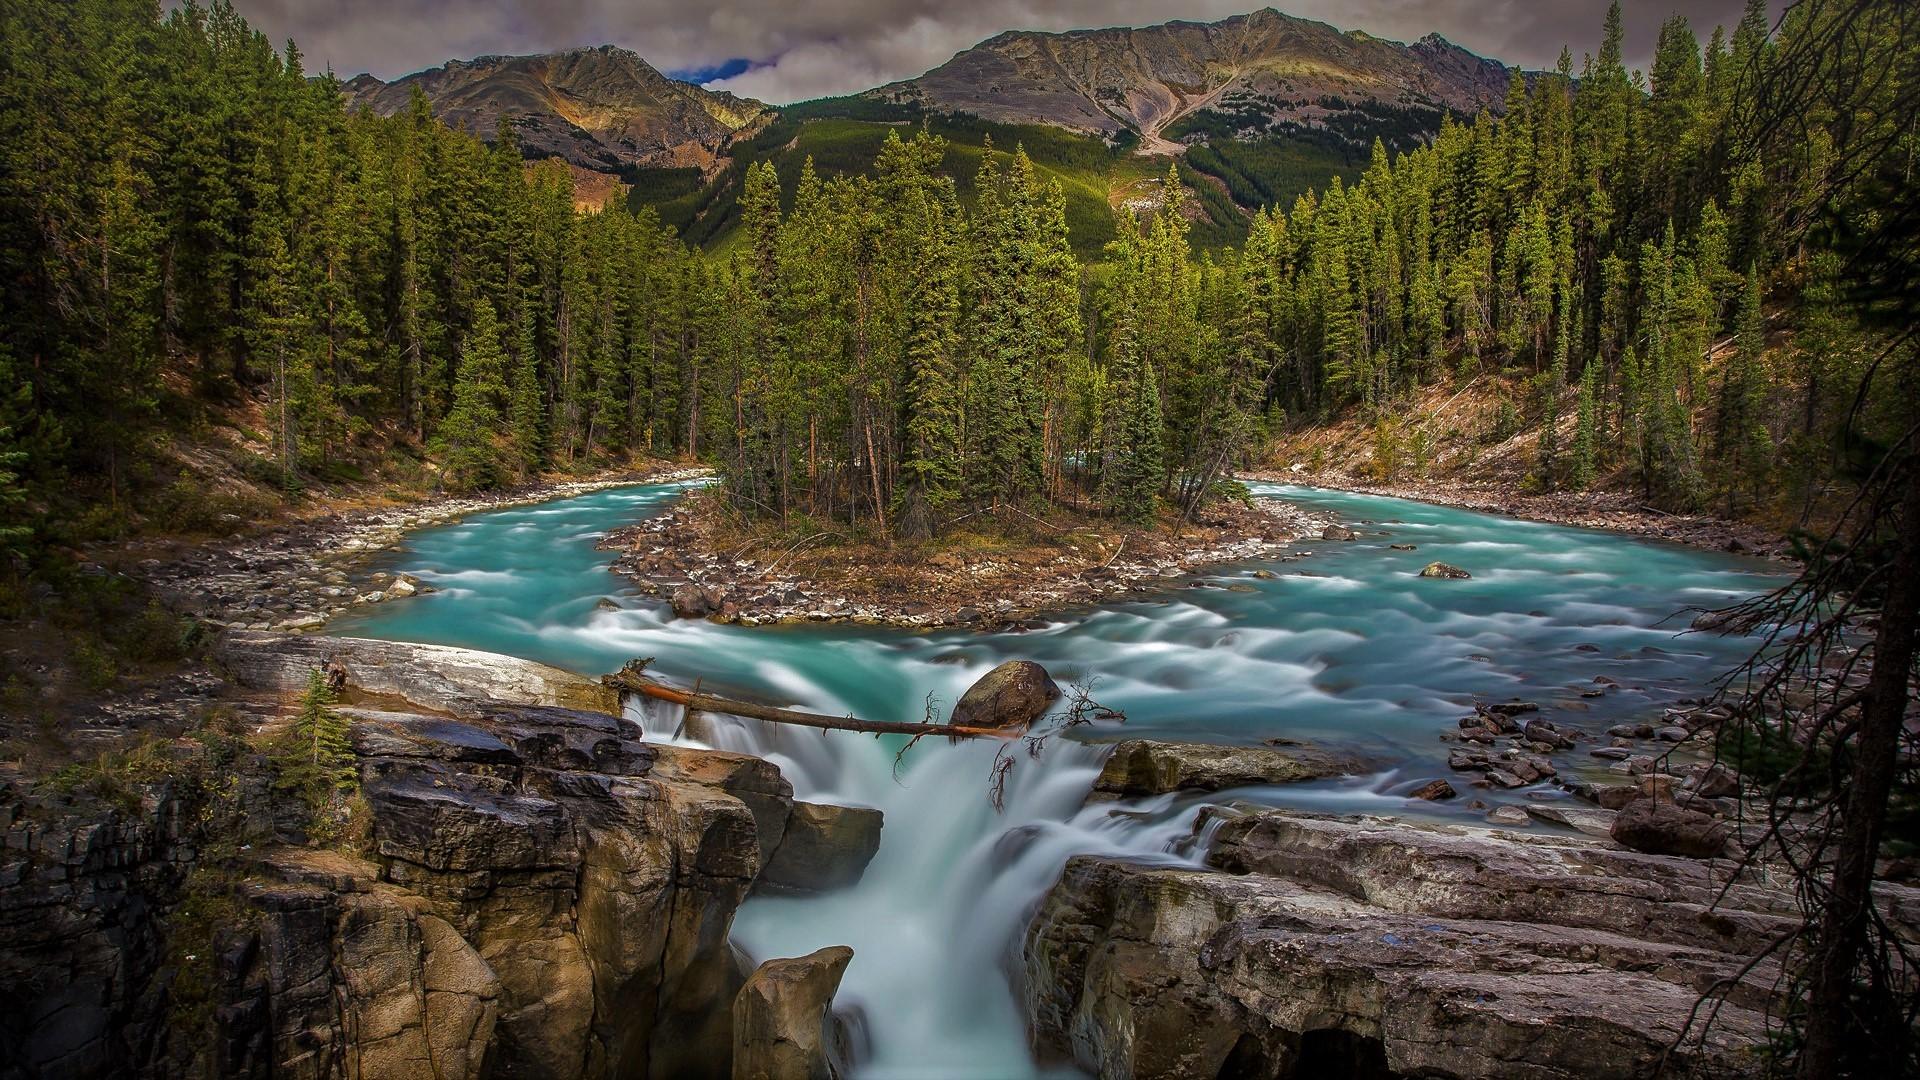 Numa Falls Wallpaper Sunwapta Falls In Jasper National Park Canada Hd